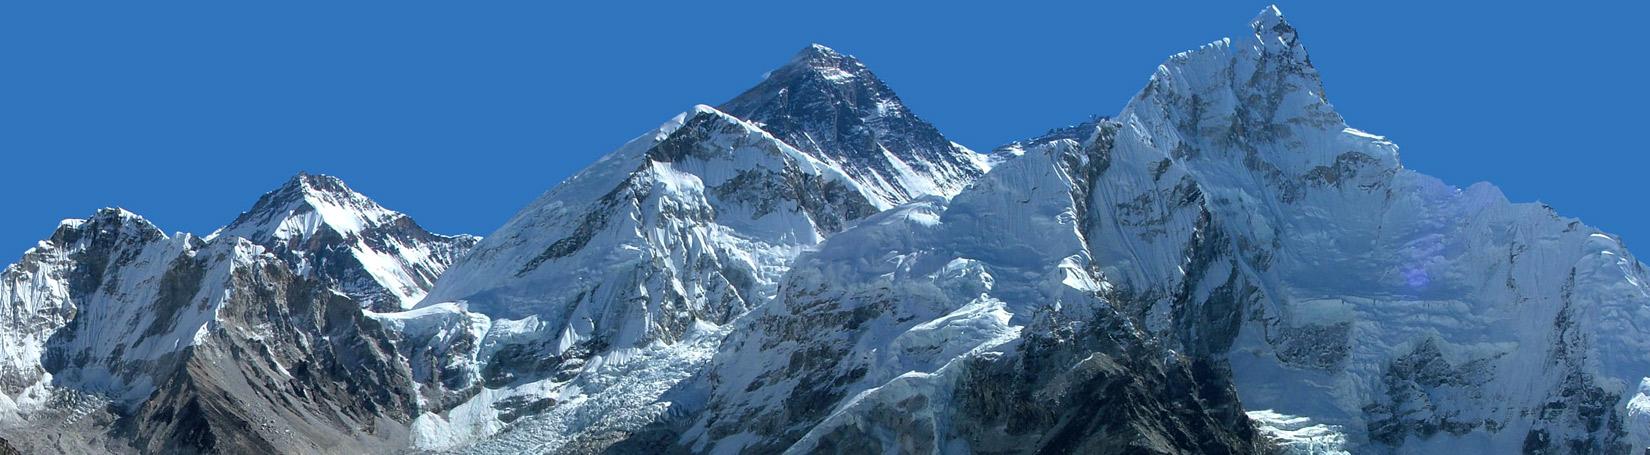 Mount Everest Lhotse Nuptse